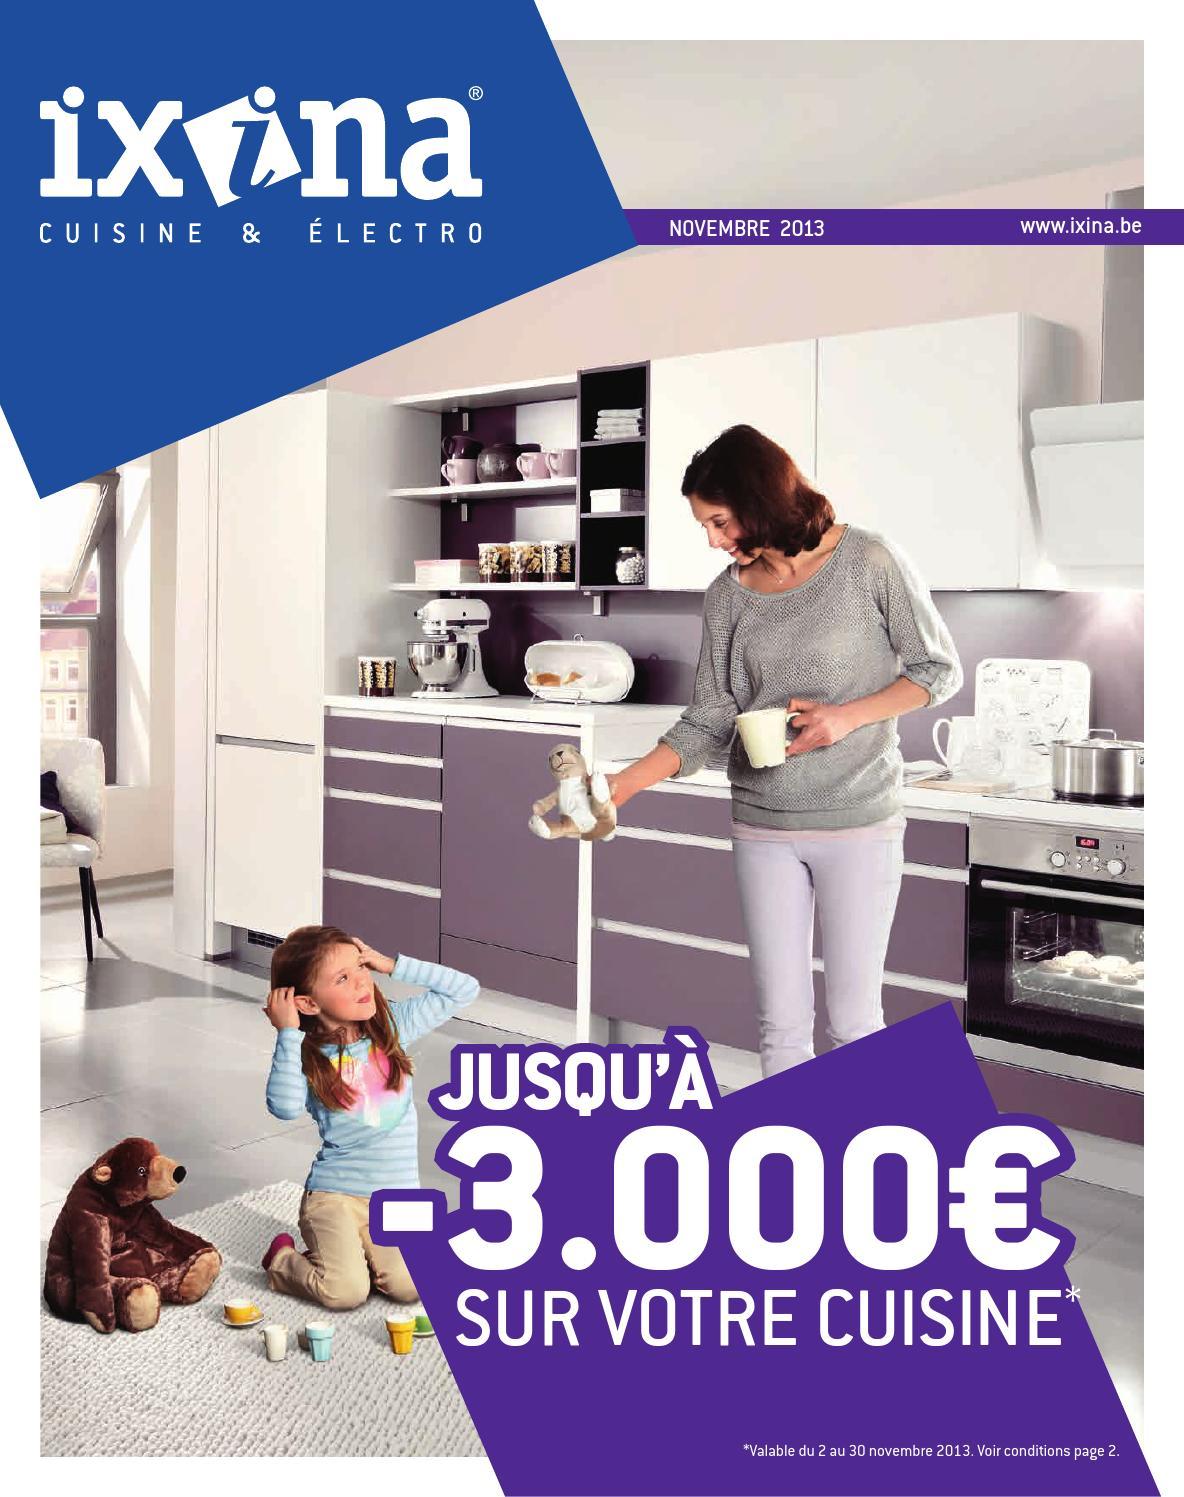 S01117130 ixina folder 235x297 belg fr p 10 hr by ixina for La cuisine x le creuset